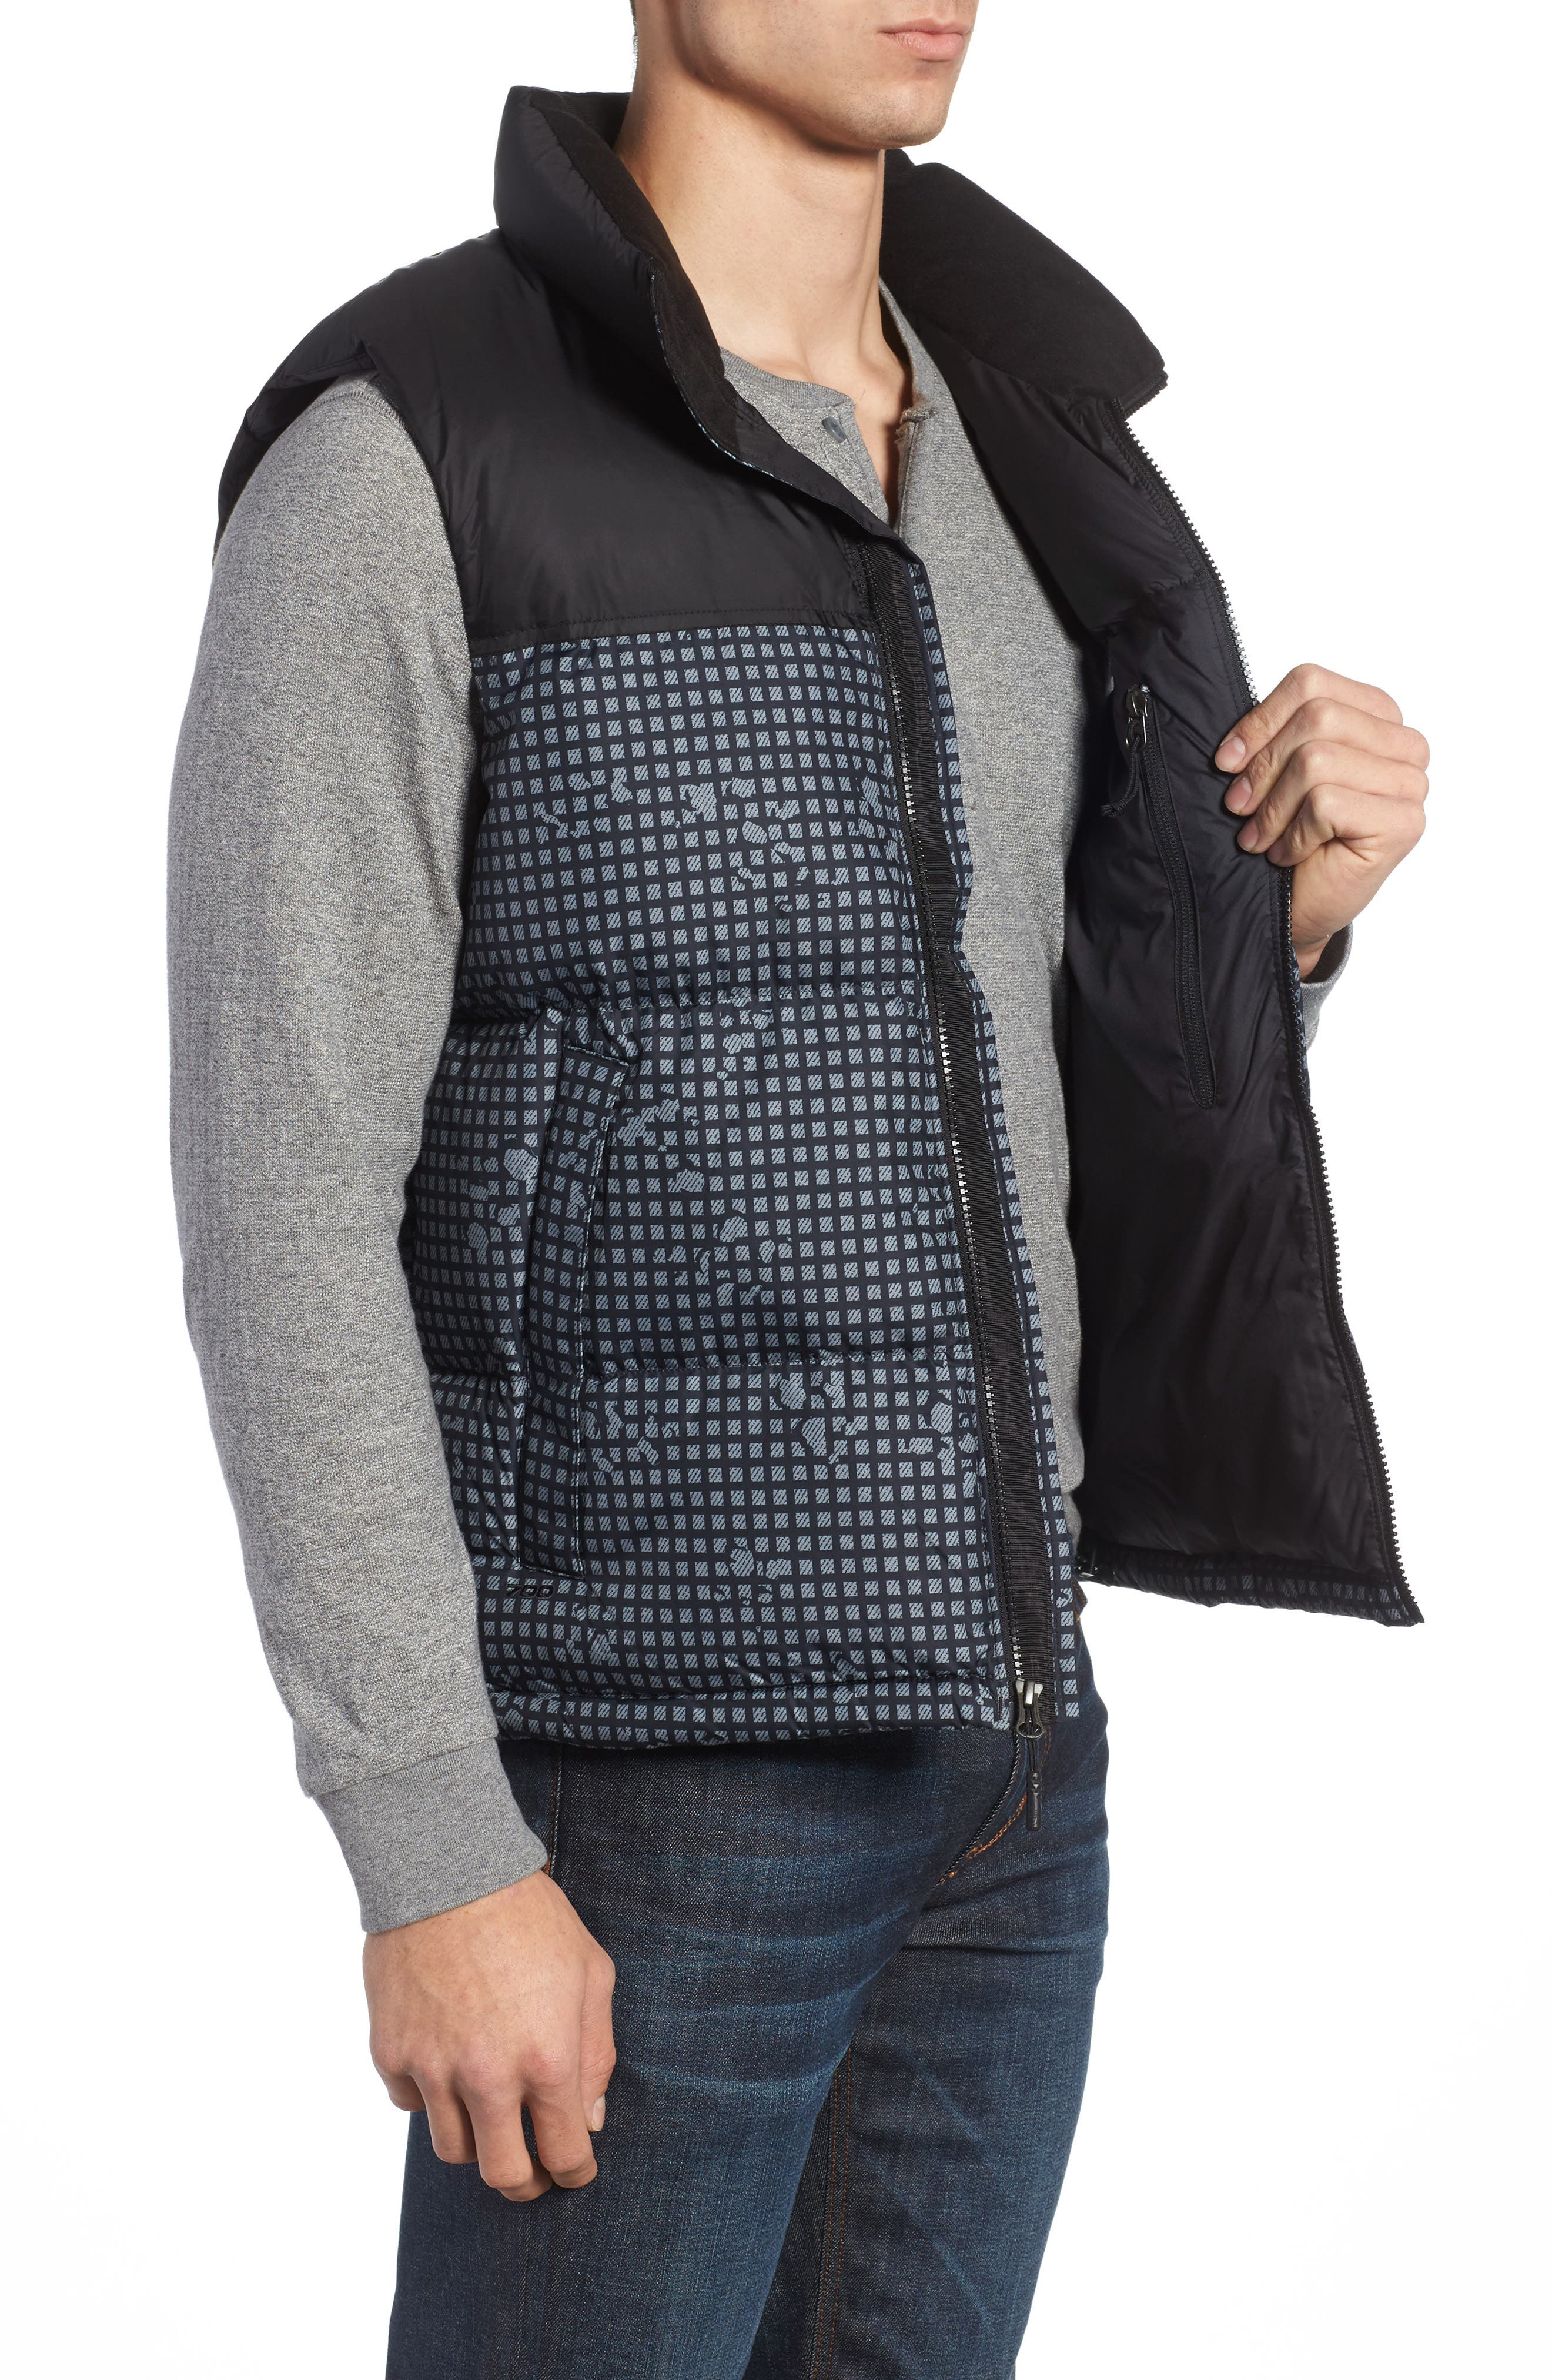 'Nuptse' Quilted Vest,                             Alternate thumbnail 3, color,                             Black Nightmoves / Black